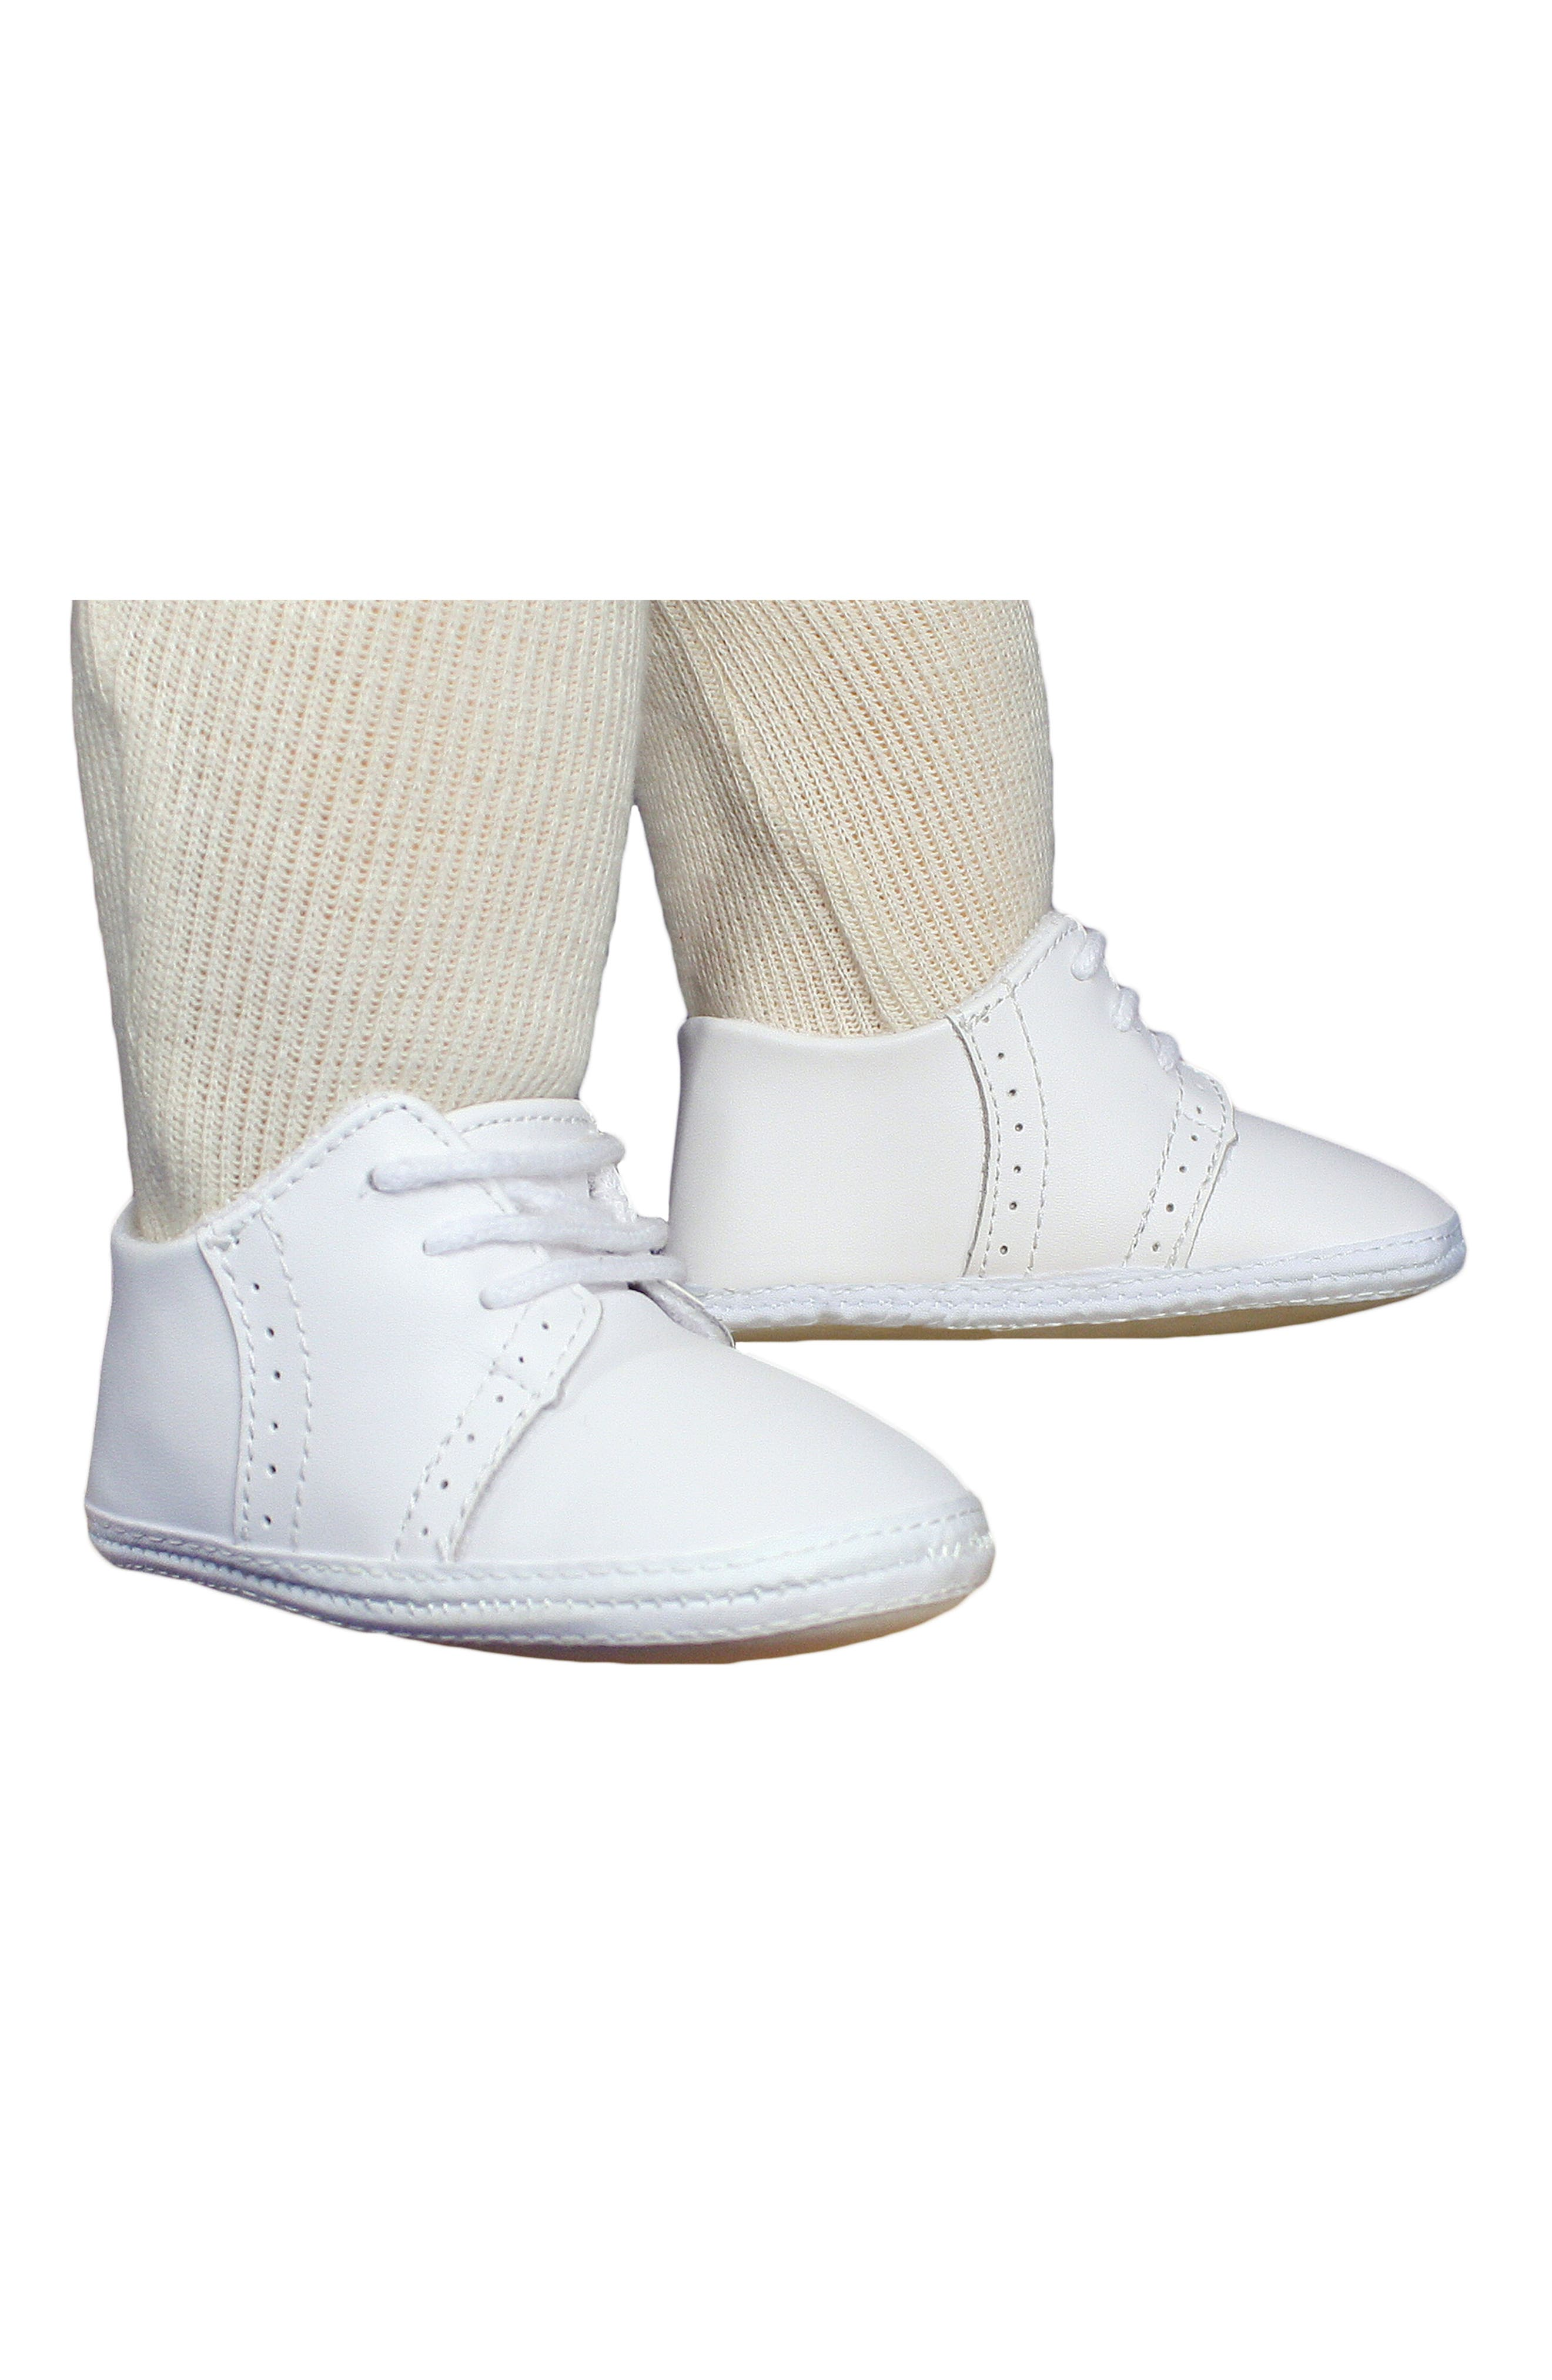 Leather Crib Shoe,                             Alternate thumbnail 4, color,                             White